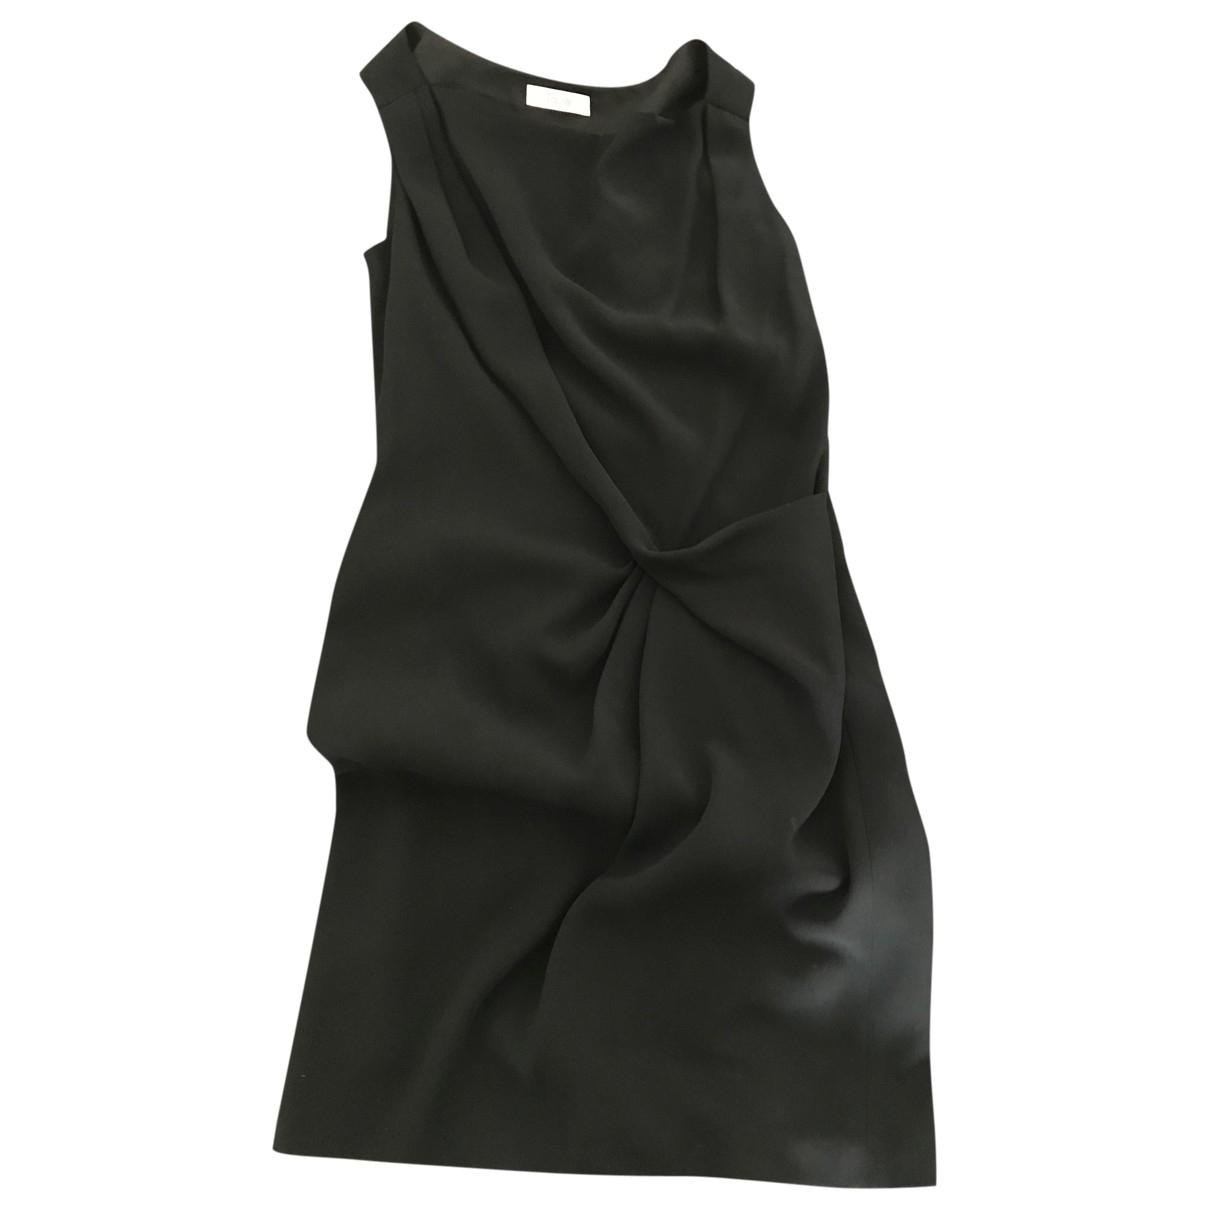 Laurel \N Black dress for Women XS International